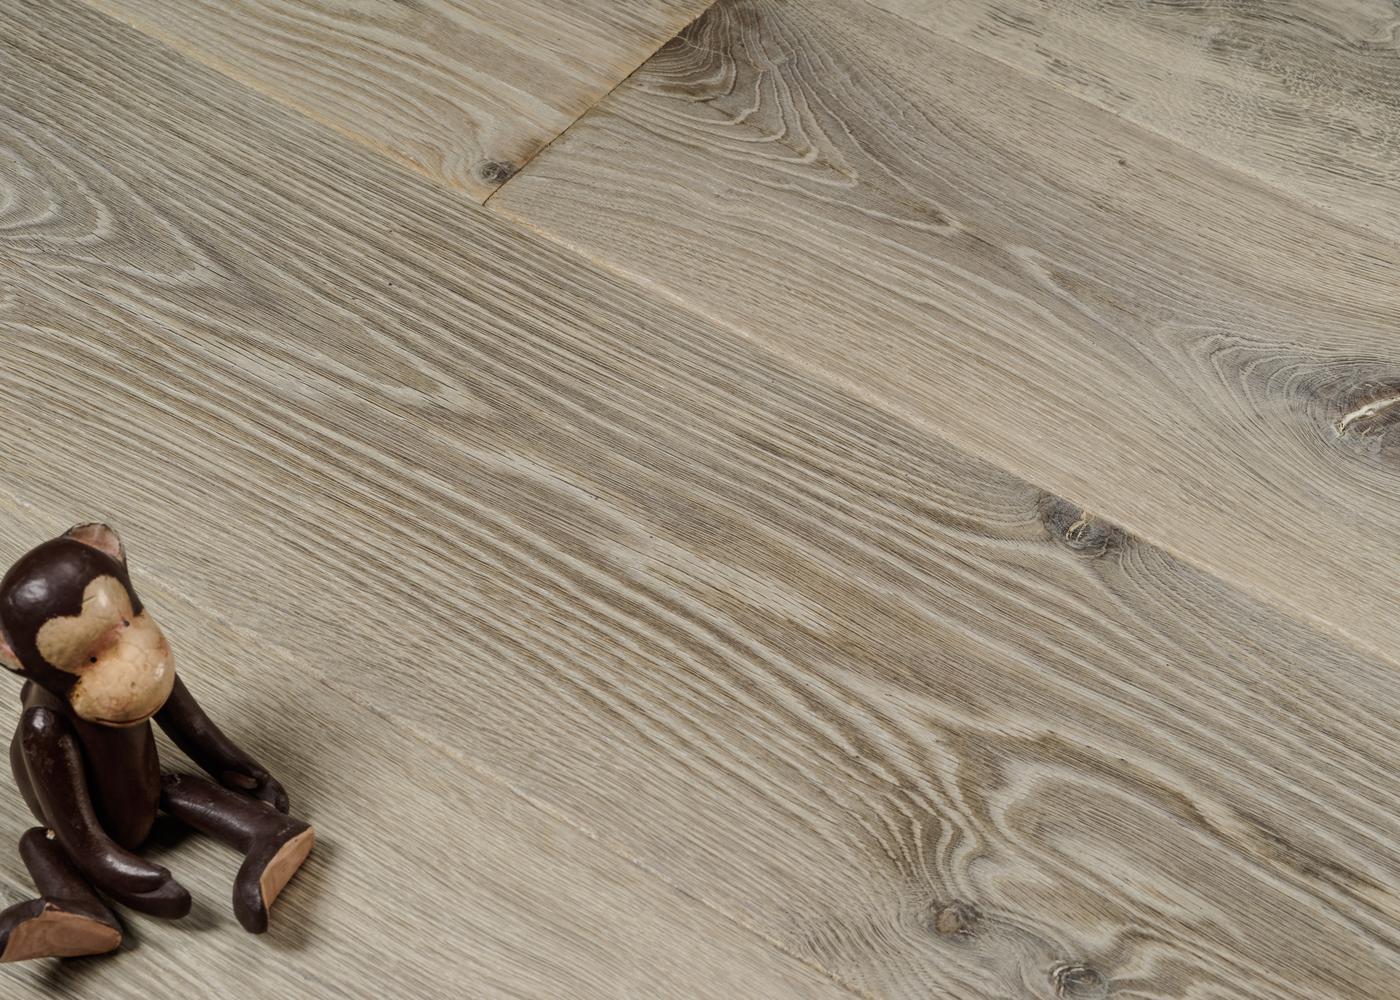 Parquet chêne contrecollé BRIGHTON usé brossé huile aqua 20-22x140/180/220x1800-2700